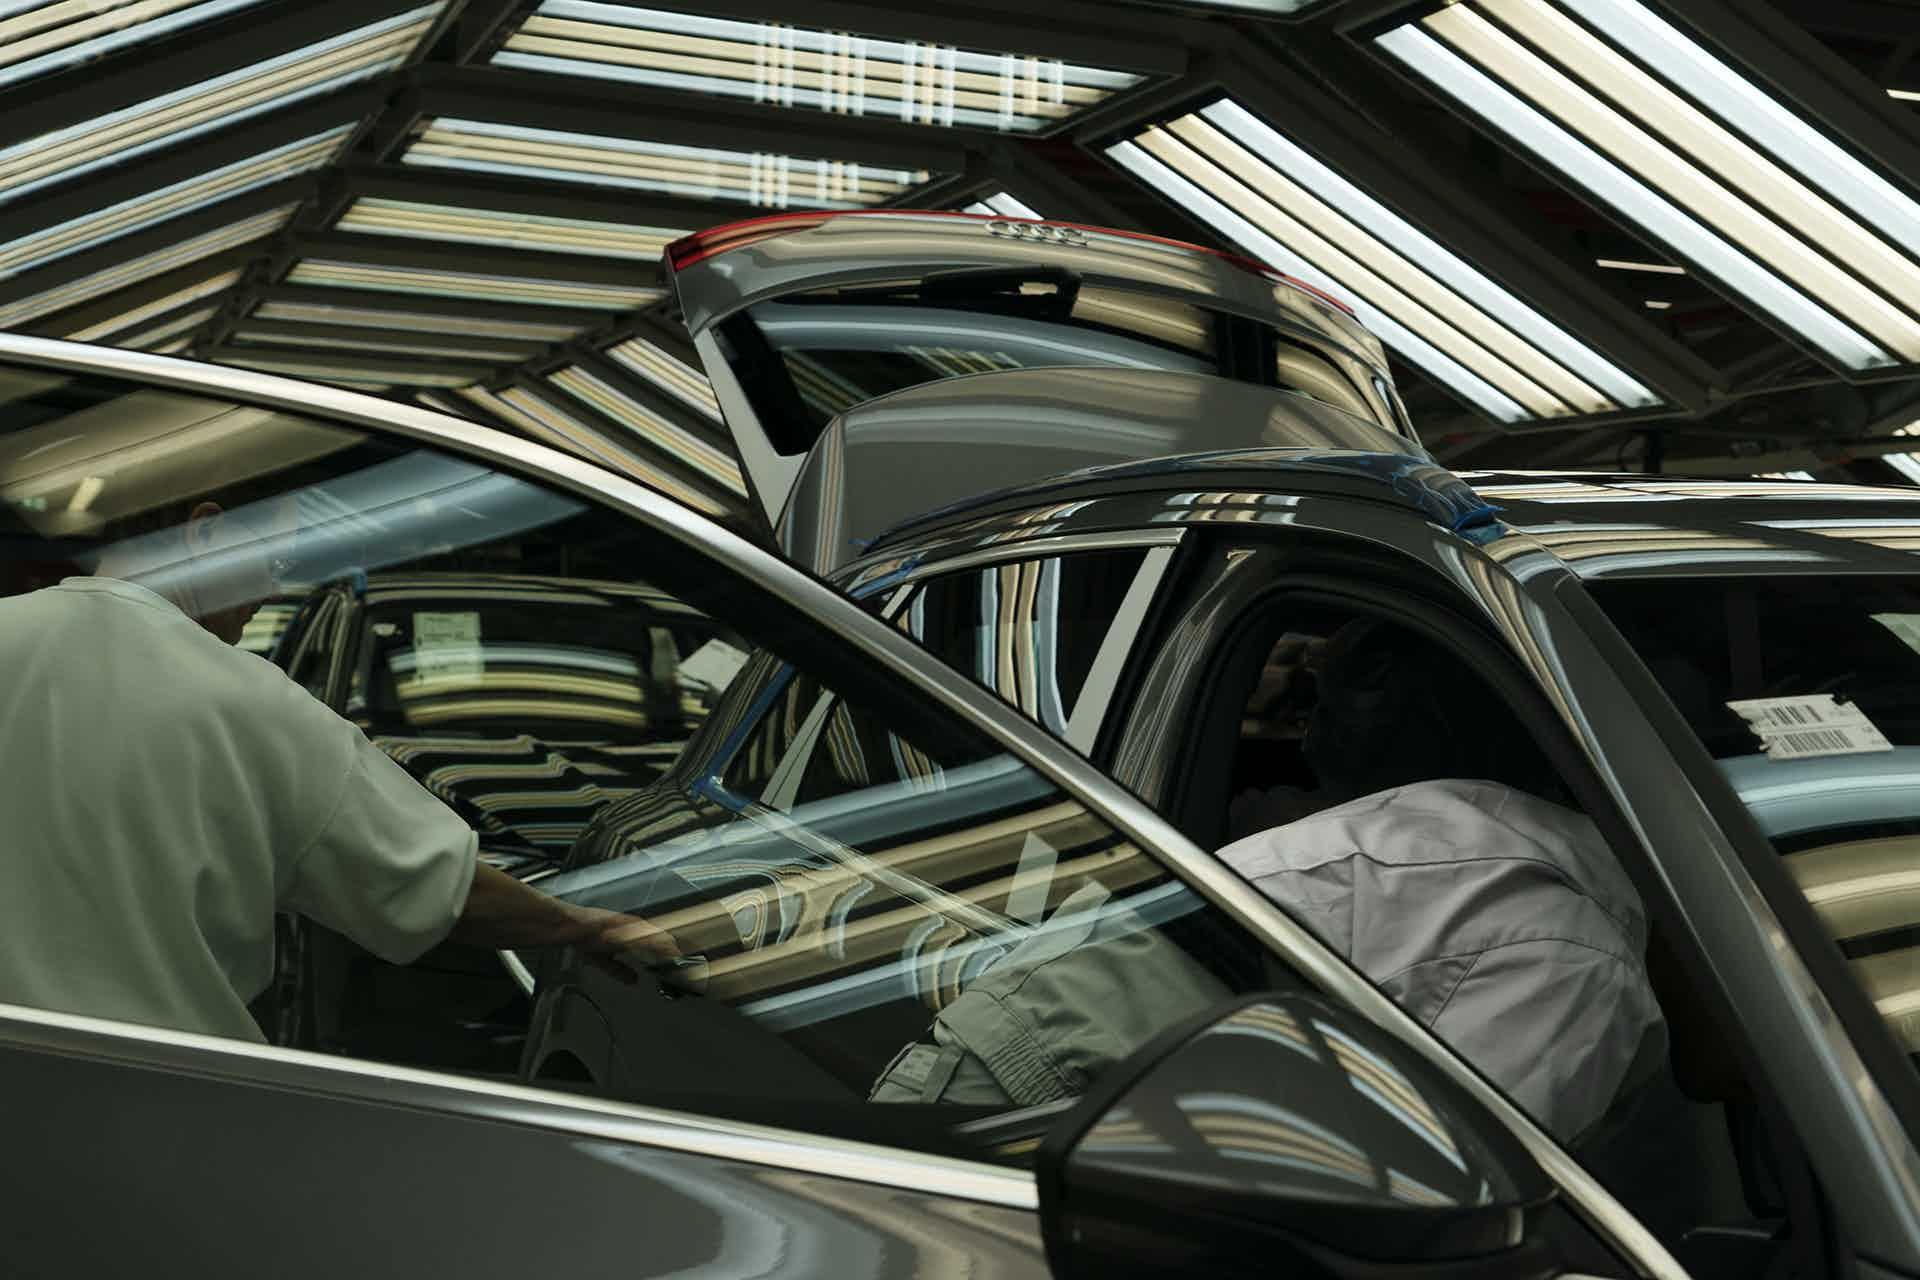 Audi e-tron by Gueorgui Pinkhassov